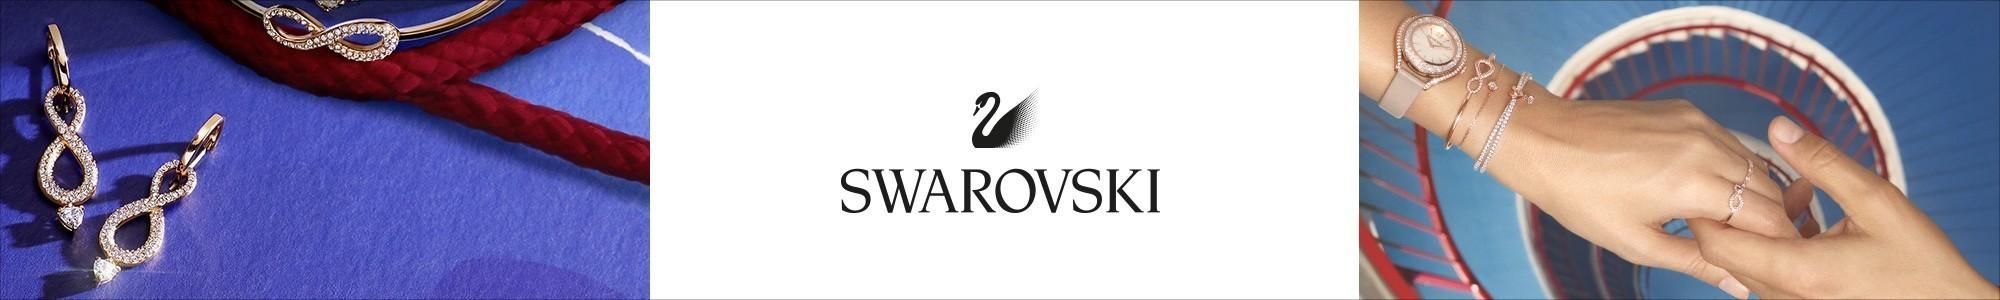 Swarovski Bijoux Karlie Kloss